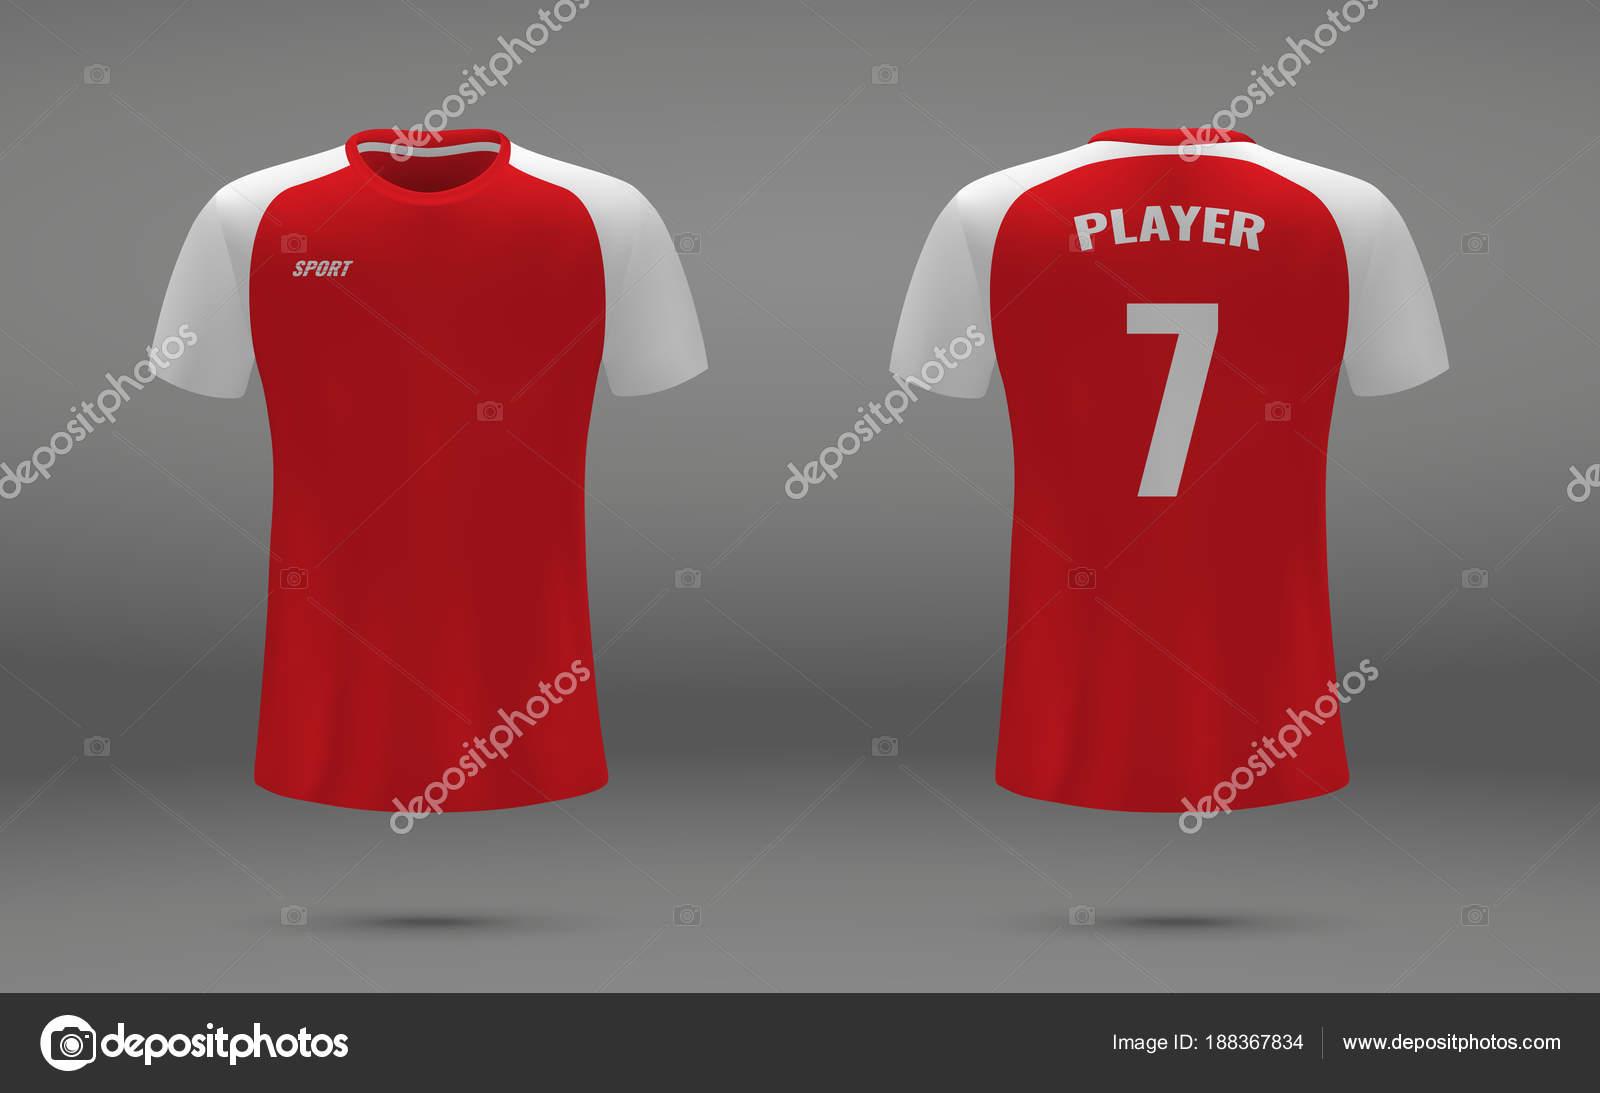 067d61a4b soccer jersey — Stock Vector © grebeshkovmaxim gmail.com  188367834